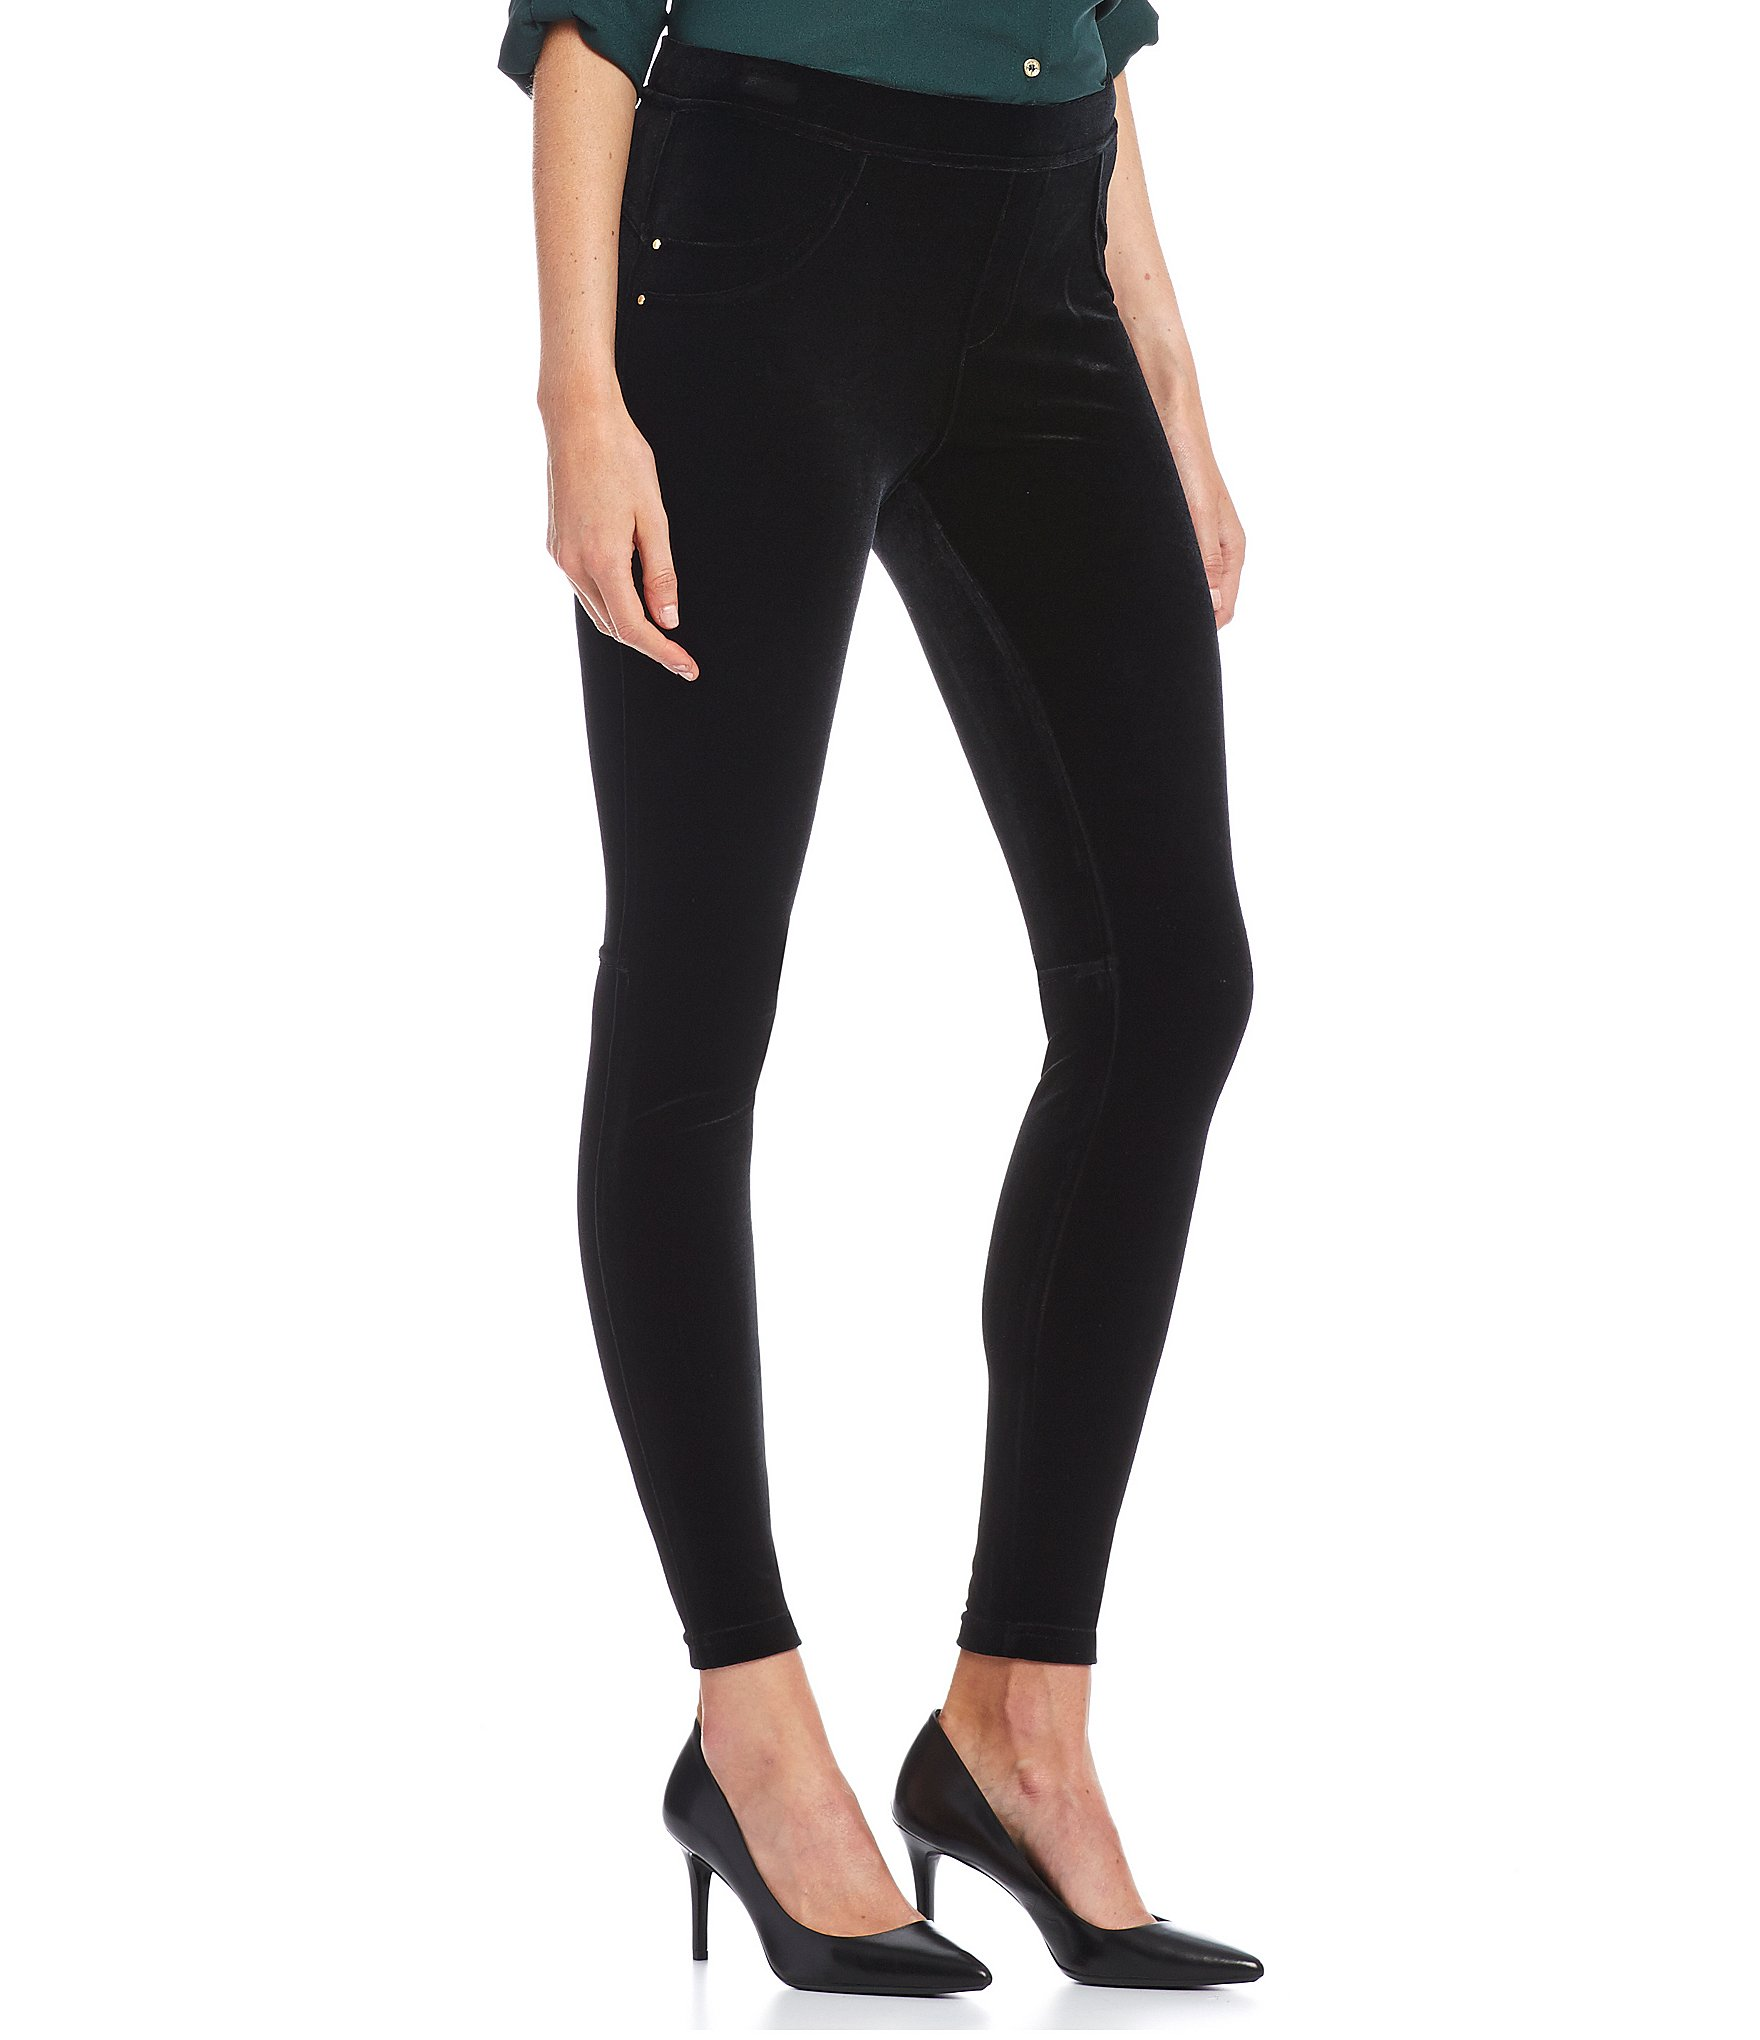 calvin klein stretch velvet leggings dillards. Black Bedroom Furniture Sets. Home Design Ideas